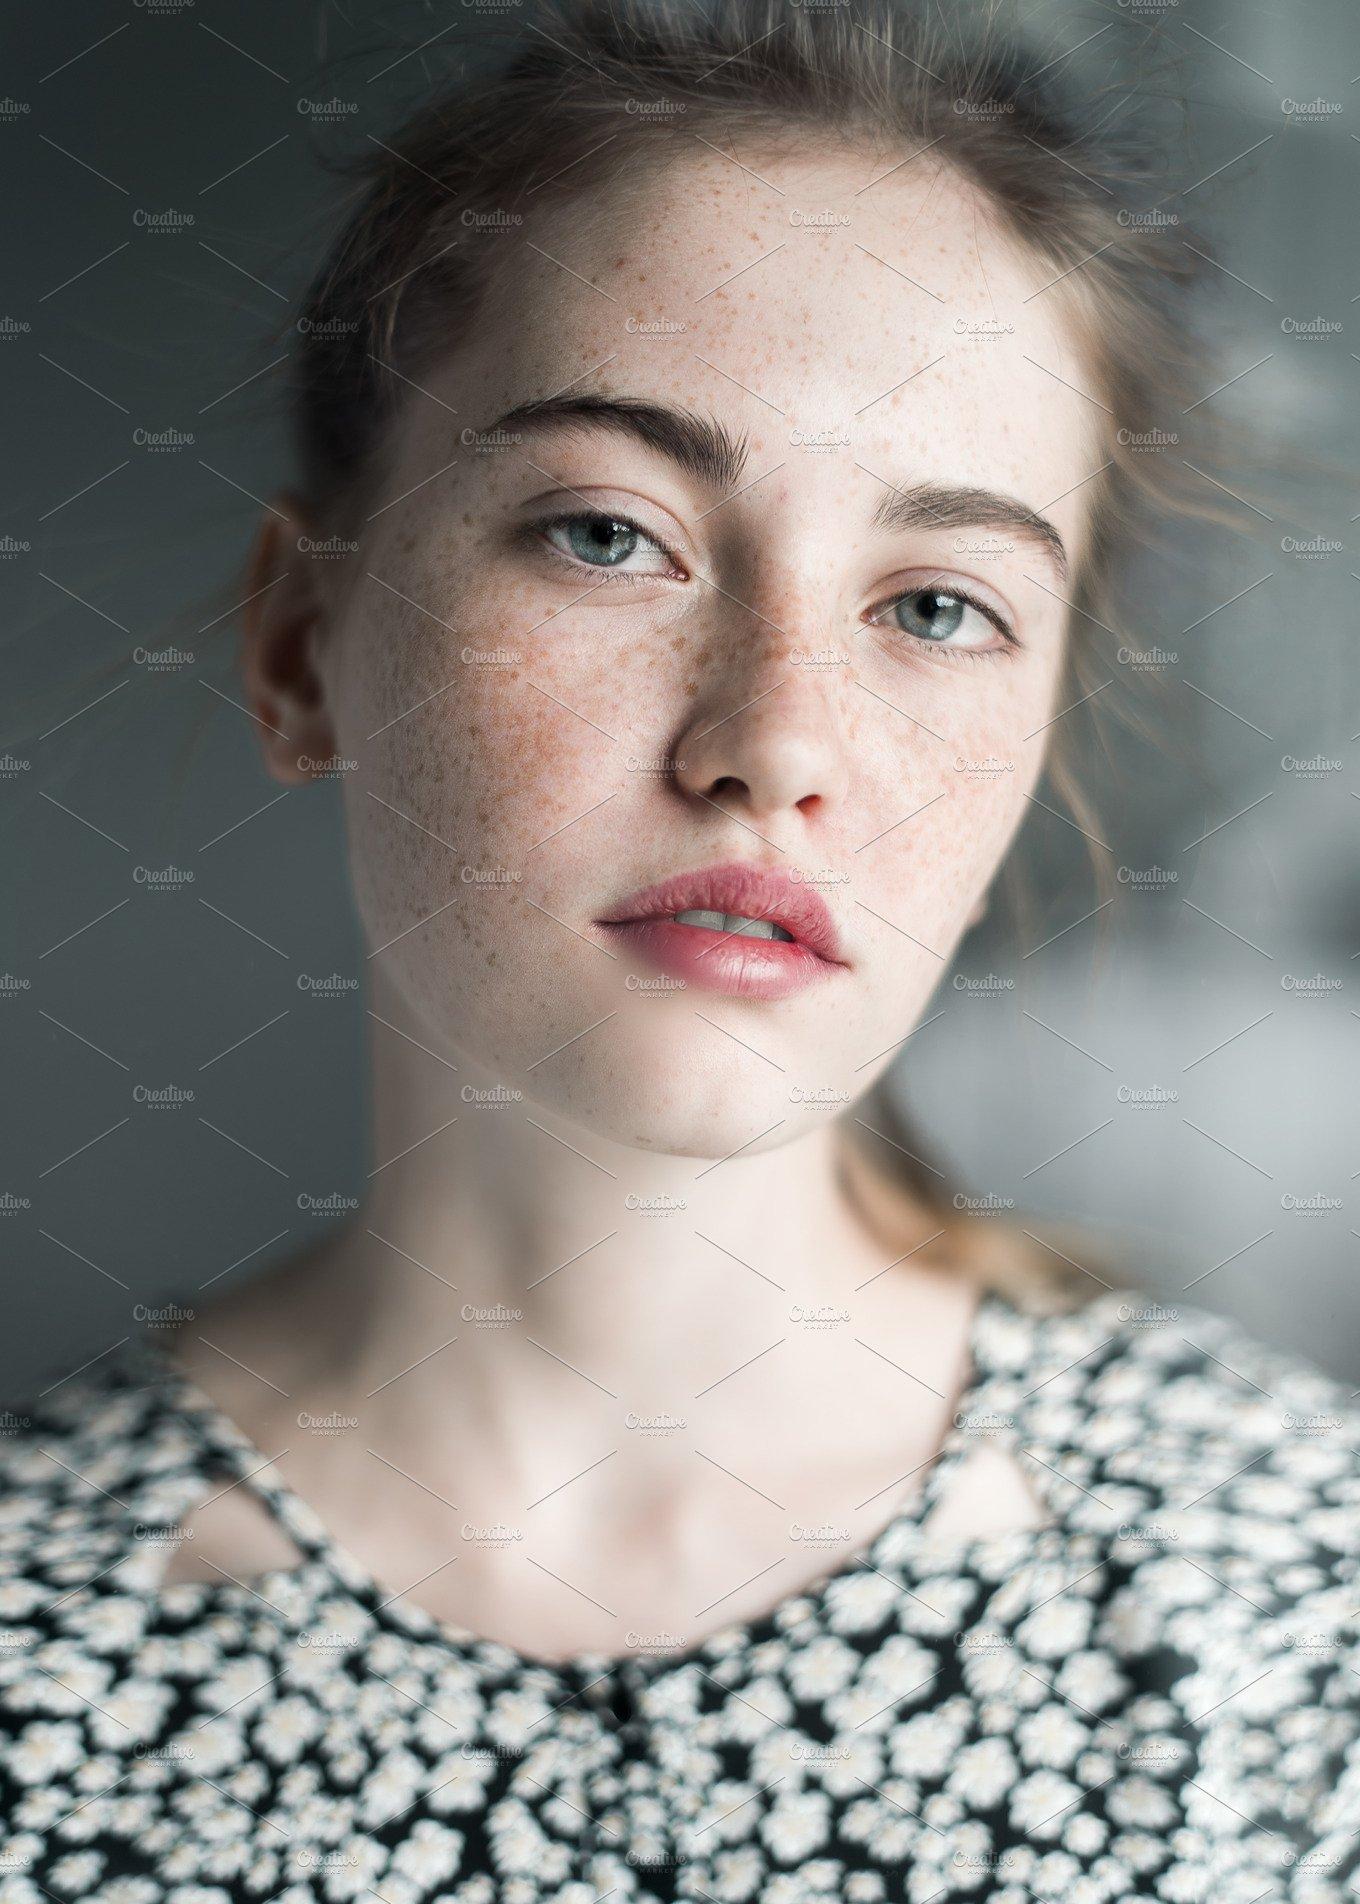 Face Of A Beautiful Young Girl  People Photos  Creative Market-5241